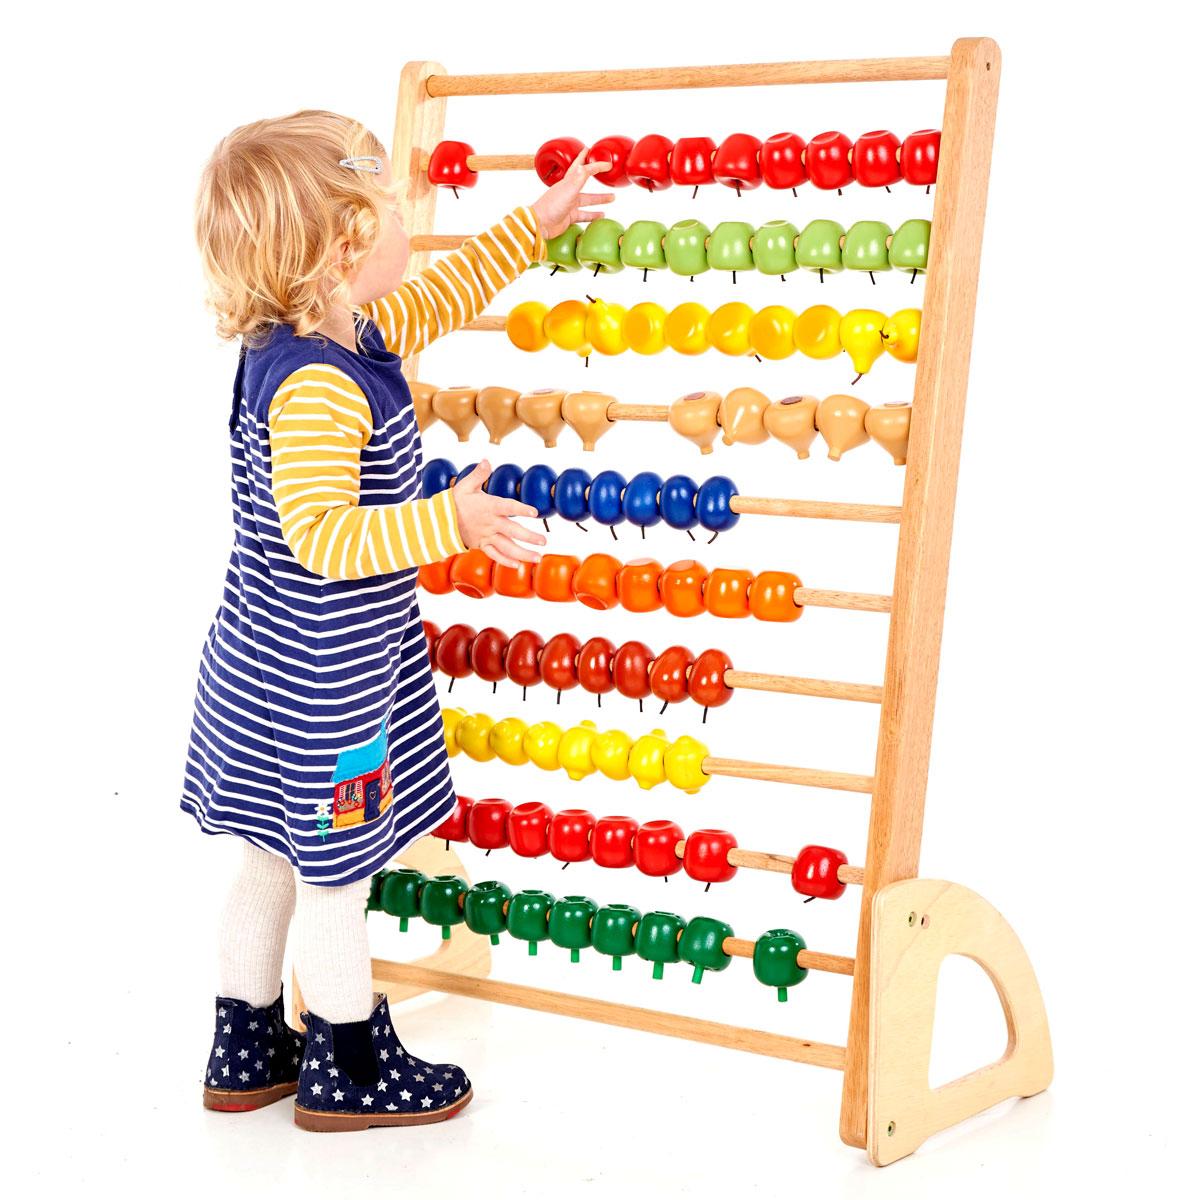 Stem School Ypsilanti: Buy School Giant Fruit Abacus CD95640